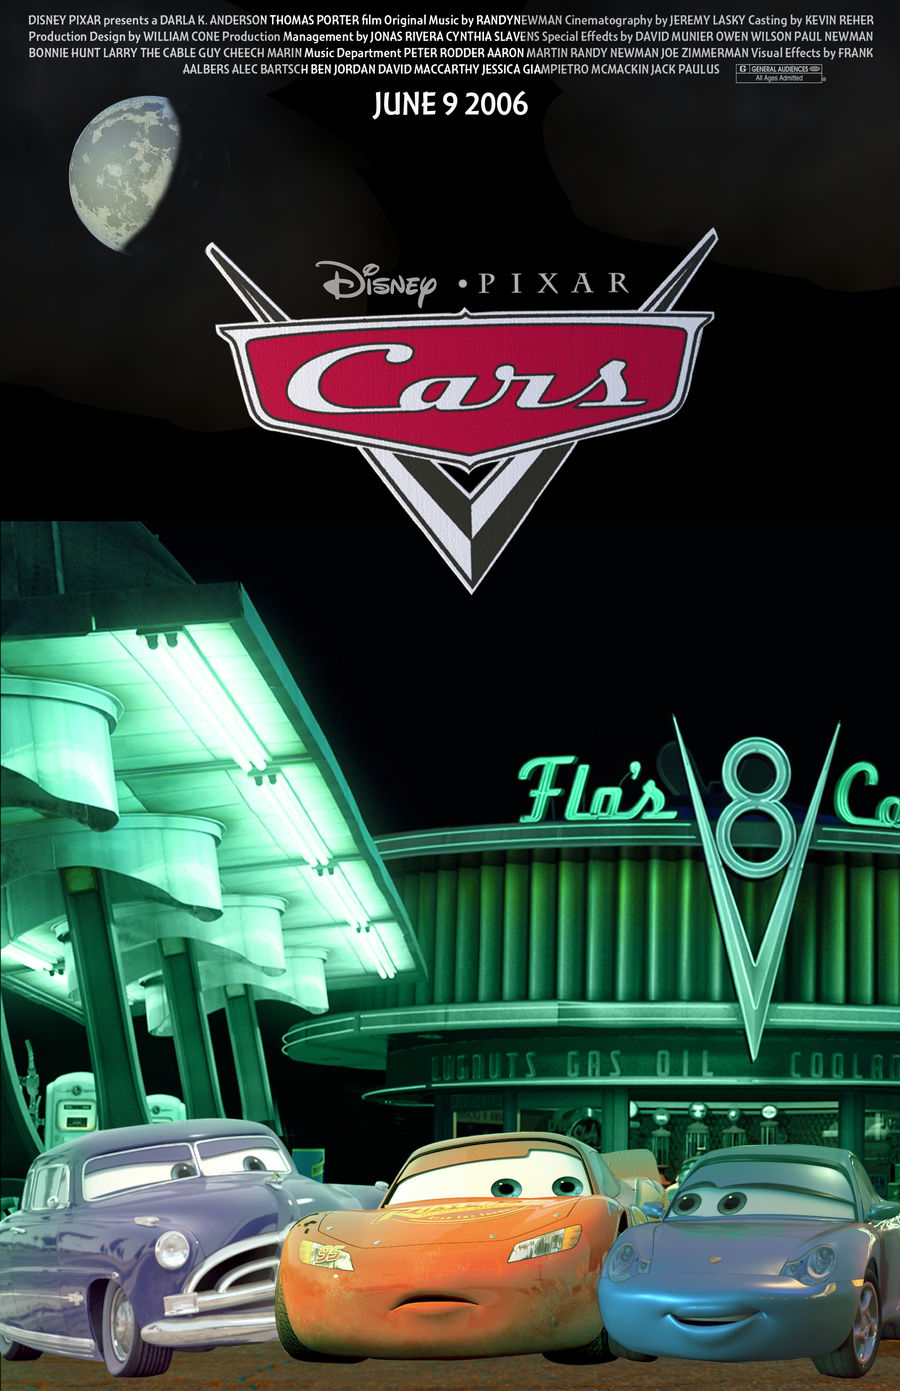 My Disney Cars Movie Poster By Sonyfan1991 On Deviantart